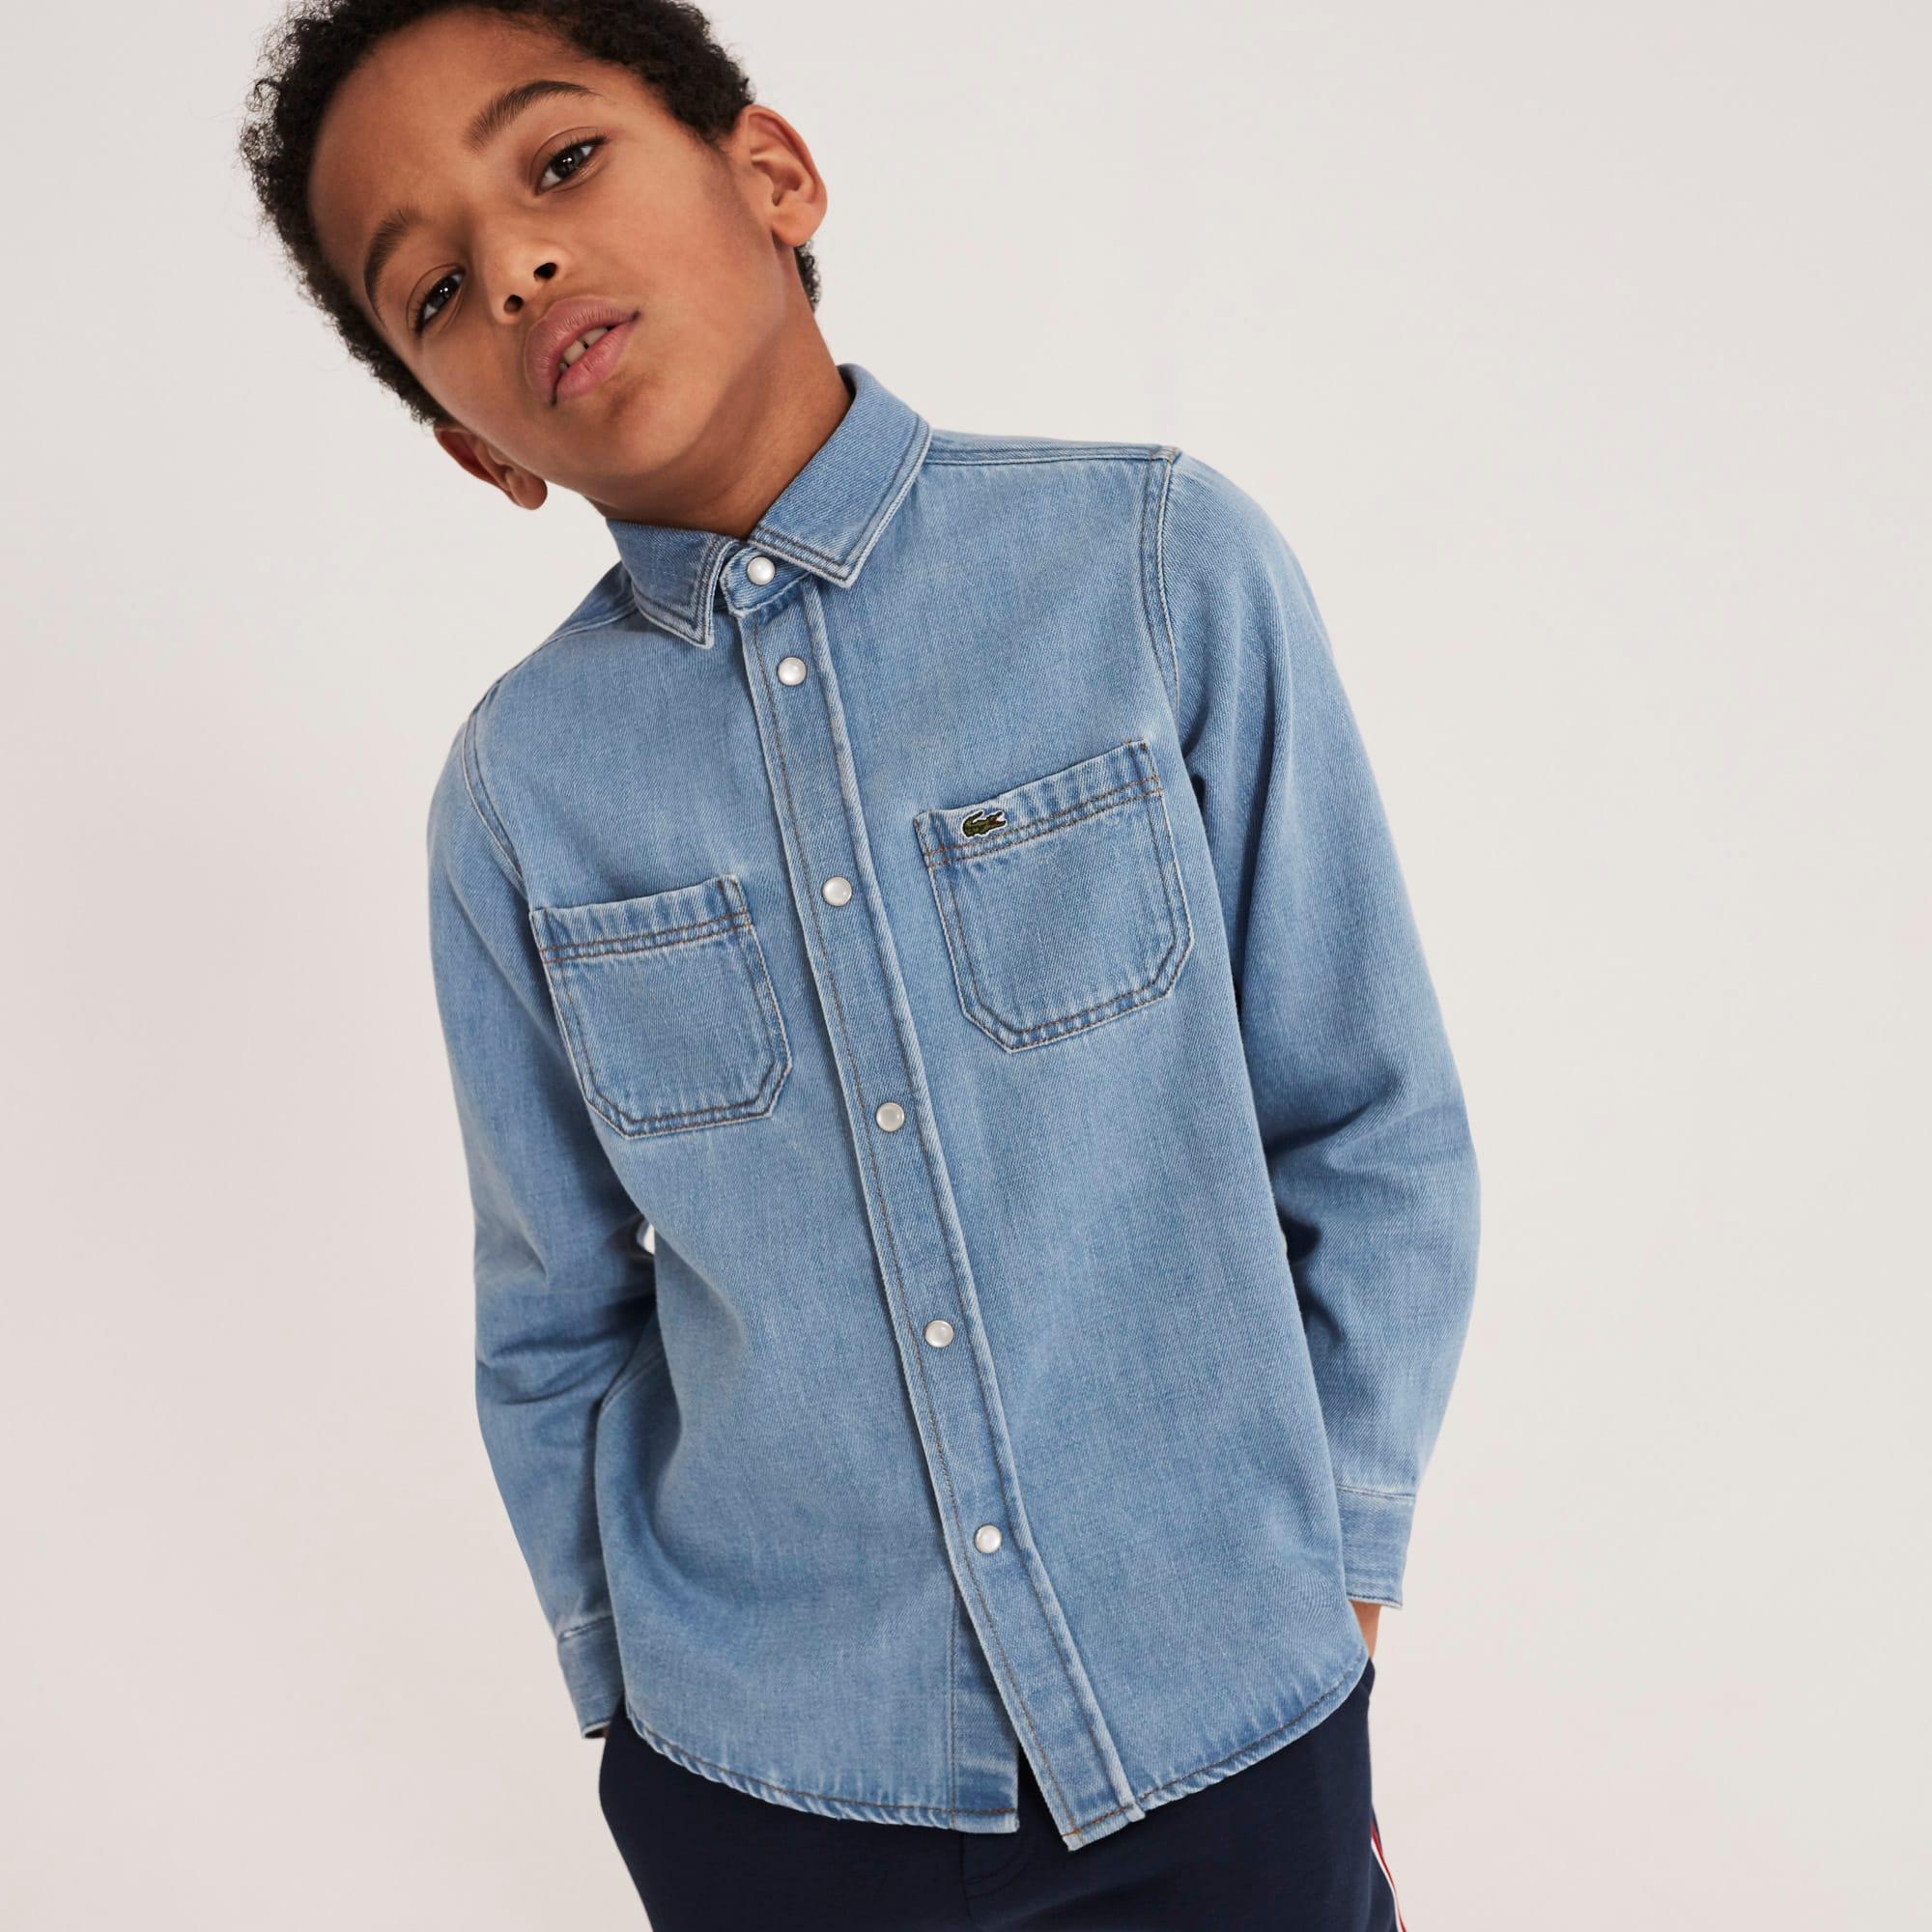 Jungen-Hemd aus Baumwolldenim